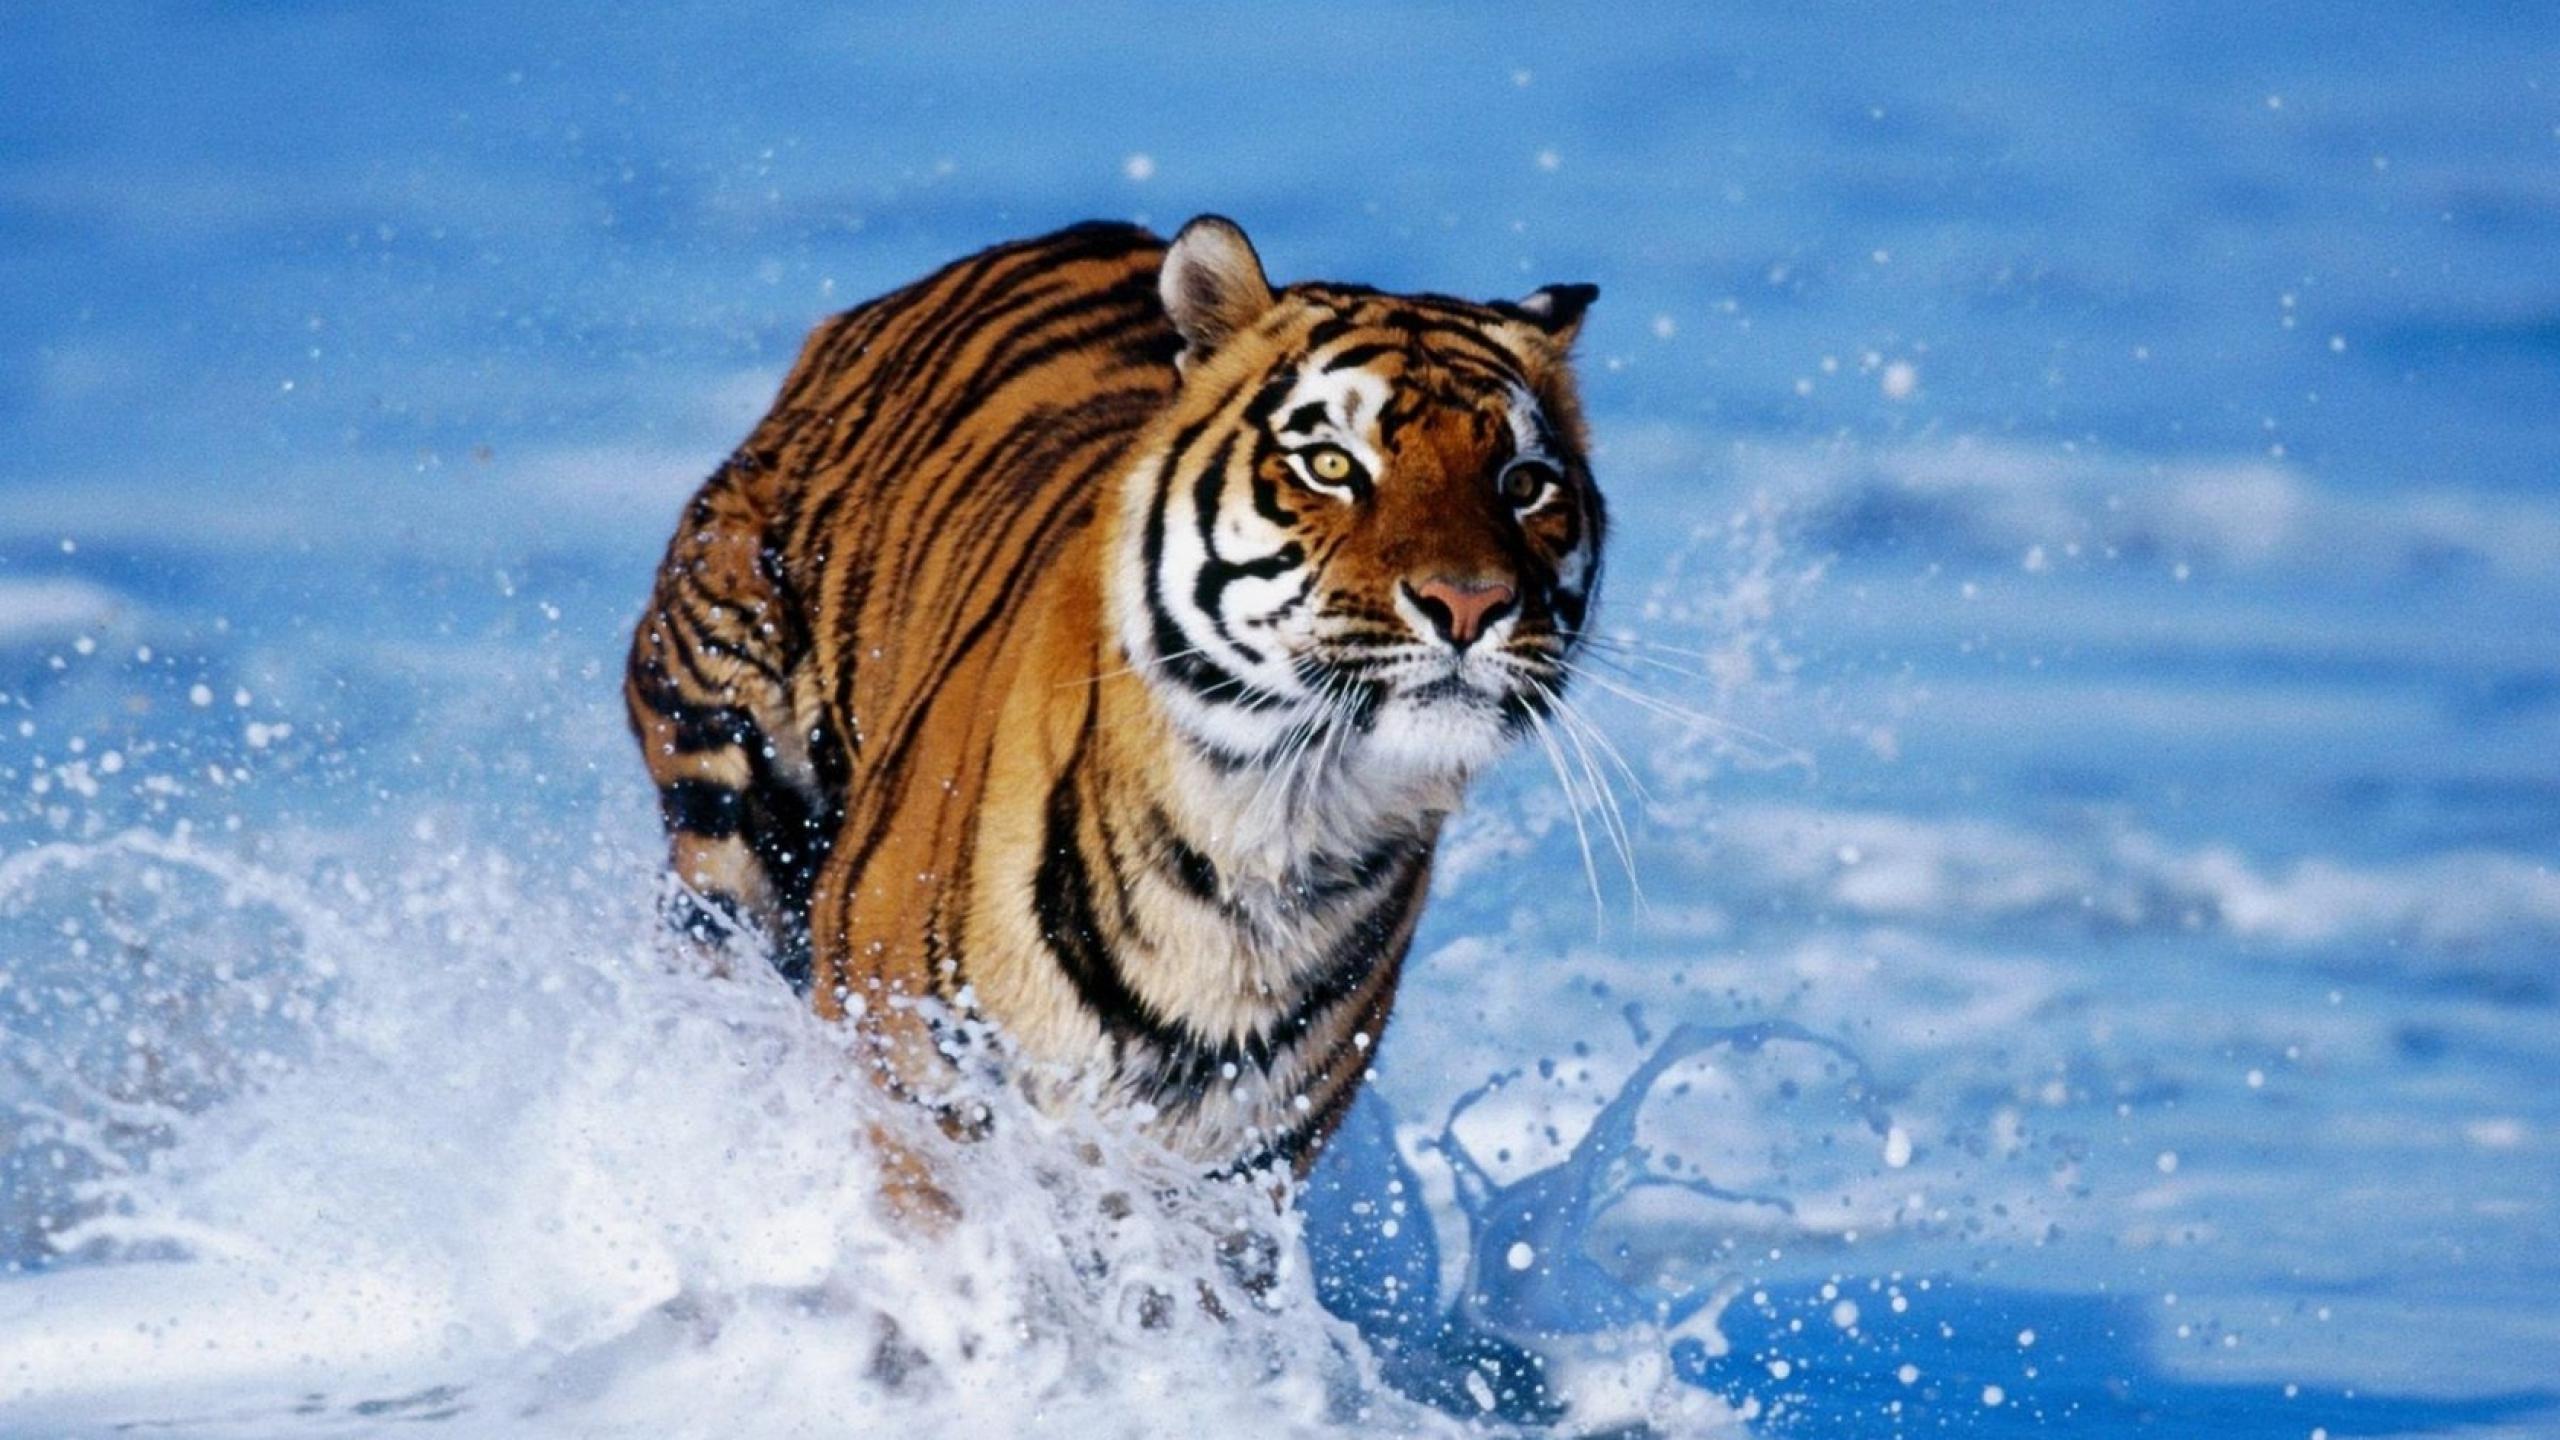 Tiger Wallpaper - Fancy Free for ...